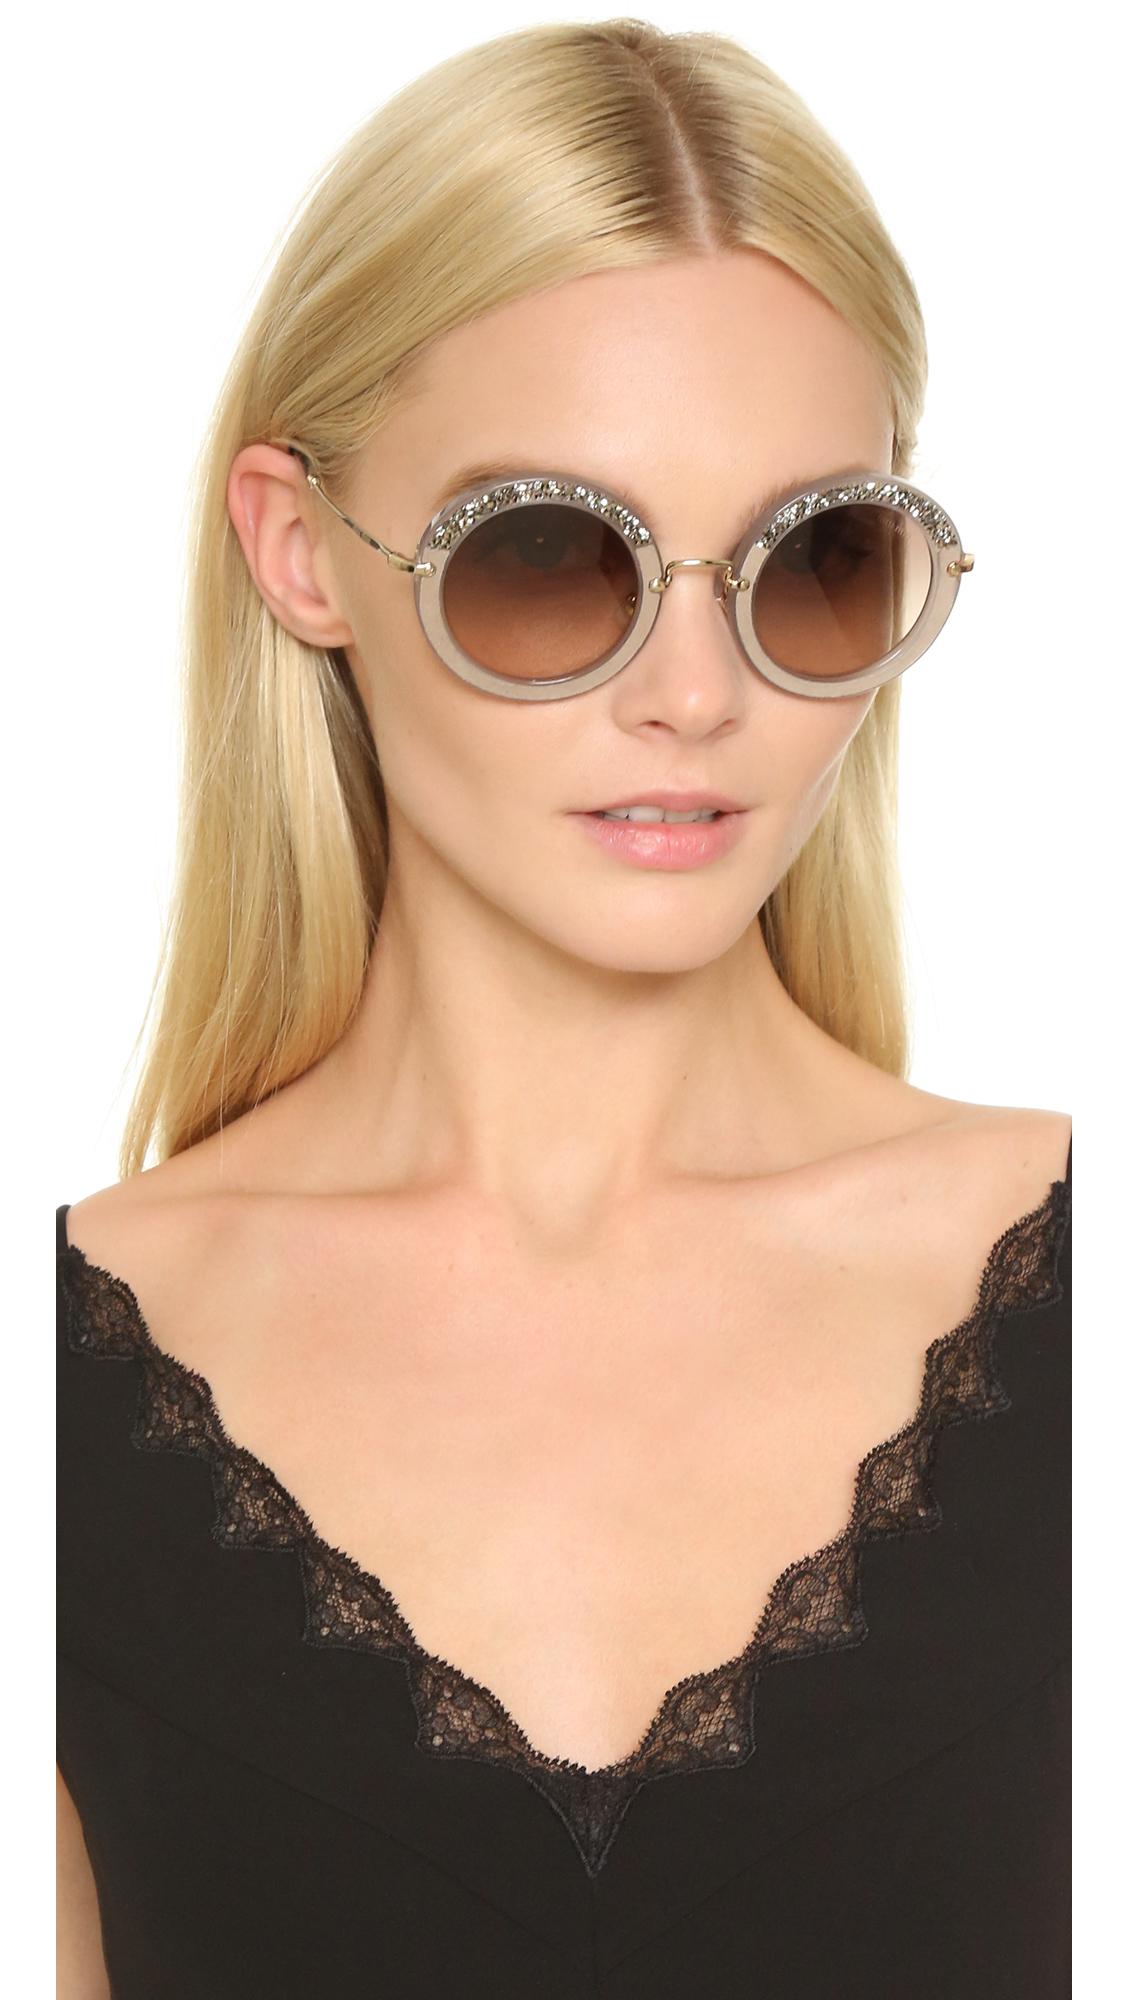 29ec14921b67c Miu Miu Round Crystal Sunglasses in Gray - Lyst